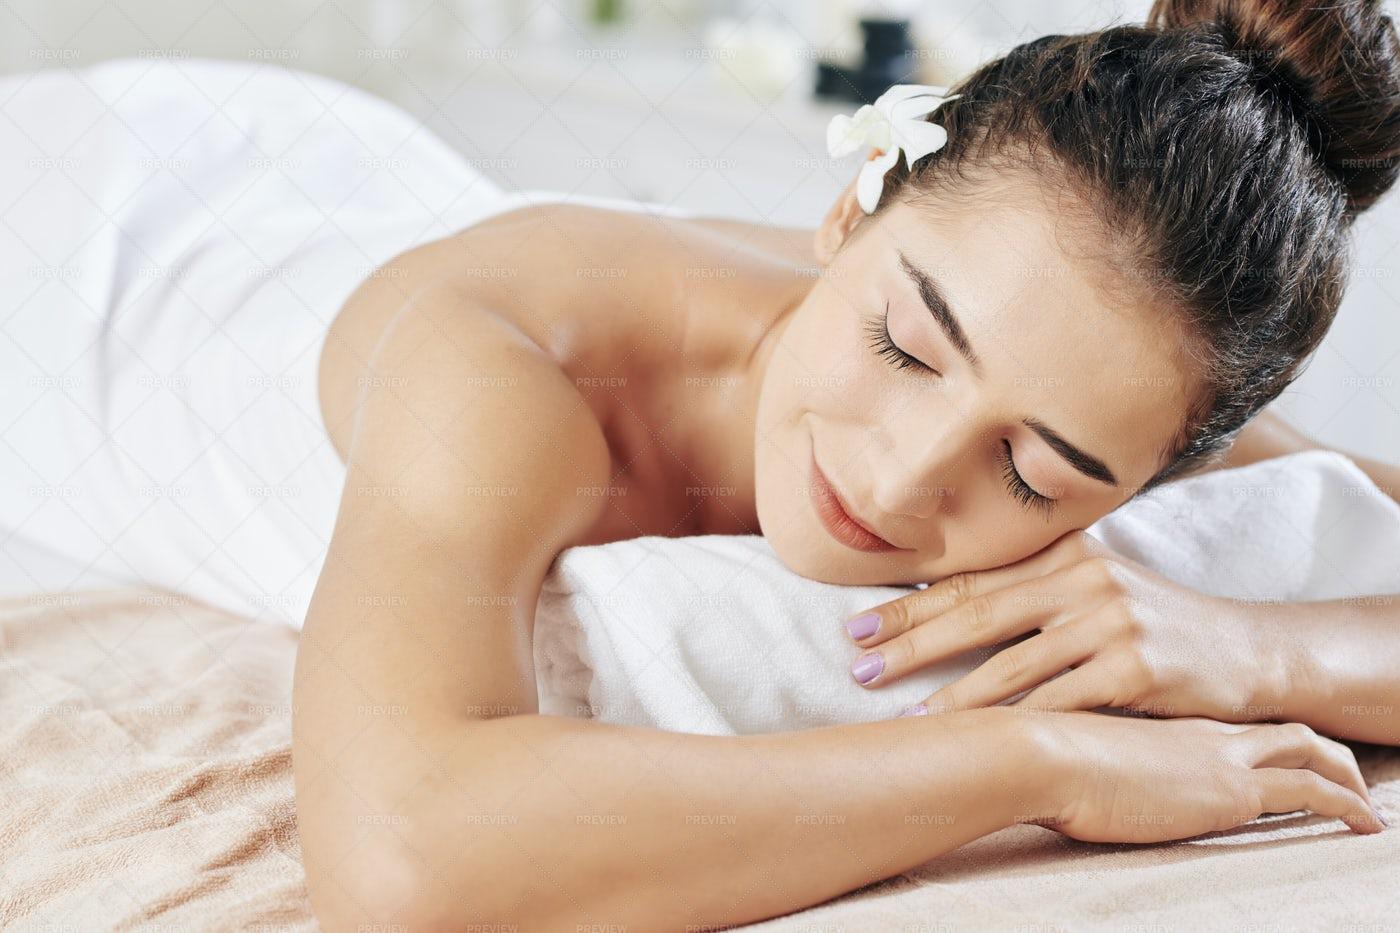 Woman Sleeping After Massage: Stock Photos